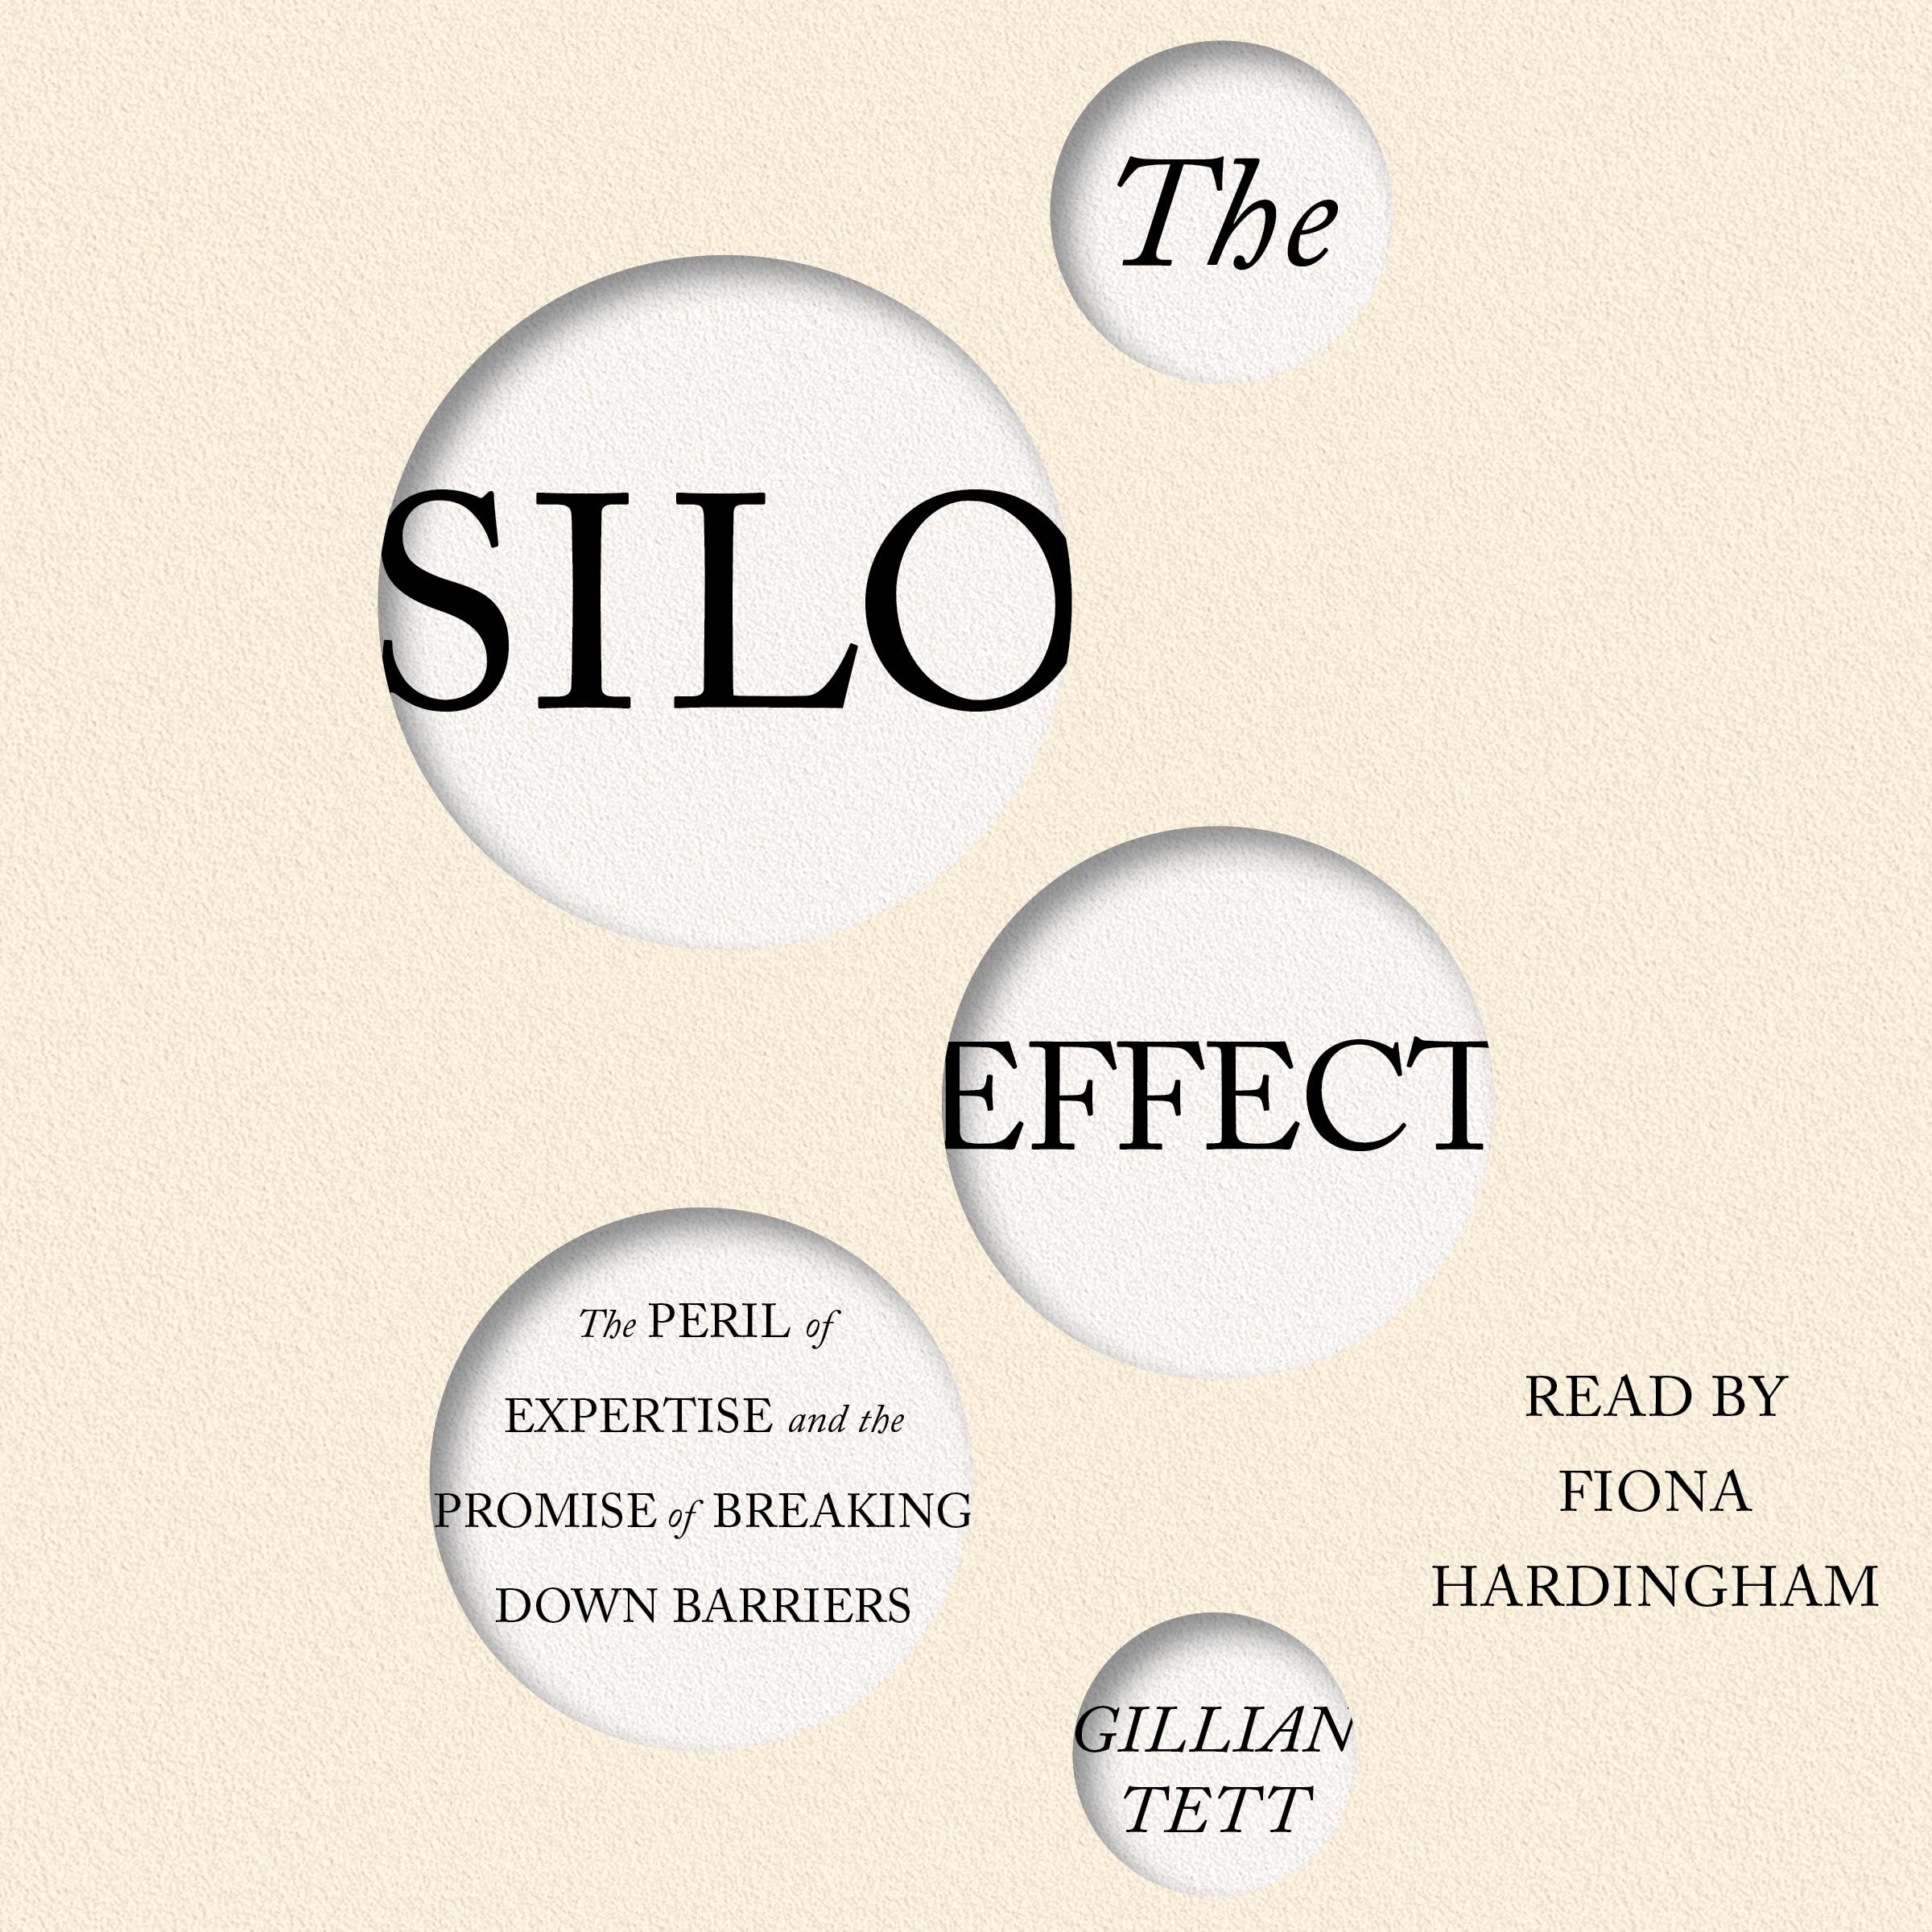 The silo effect 9781442391710 hr